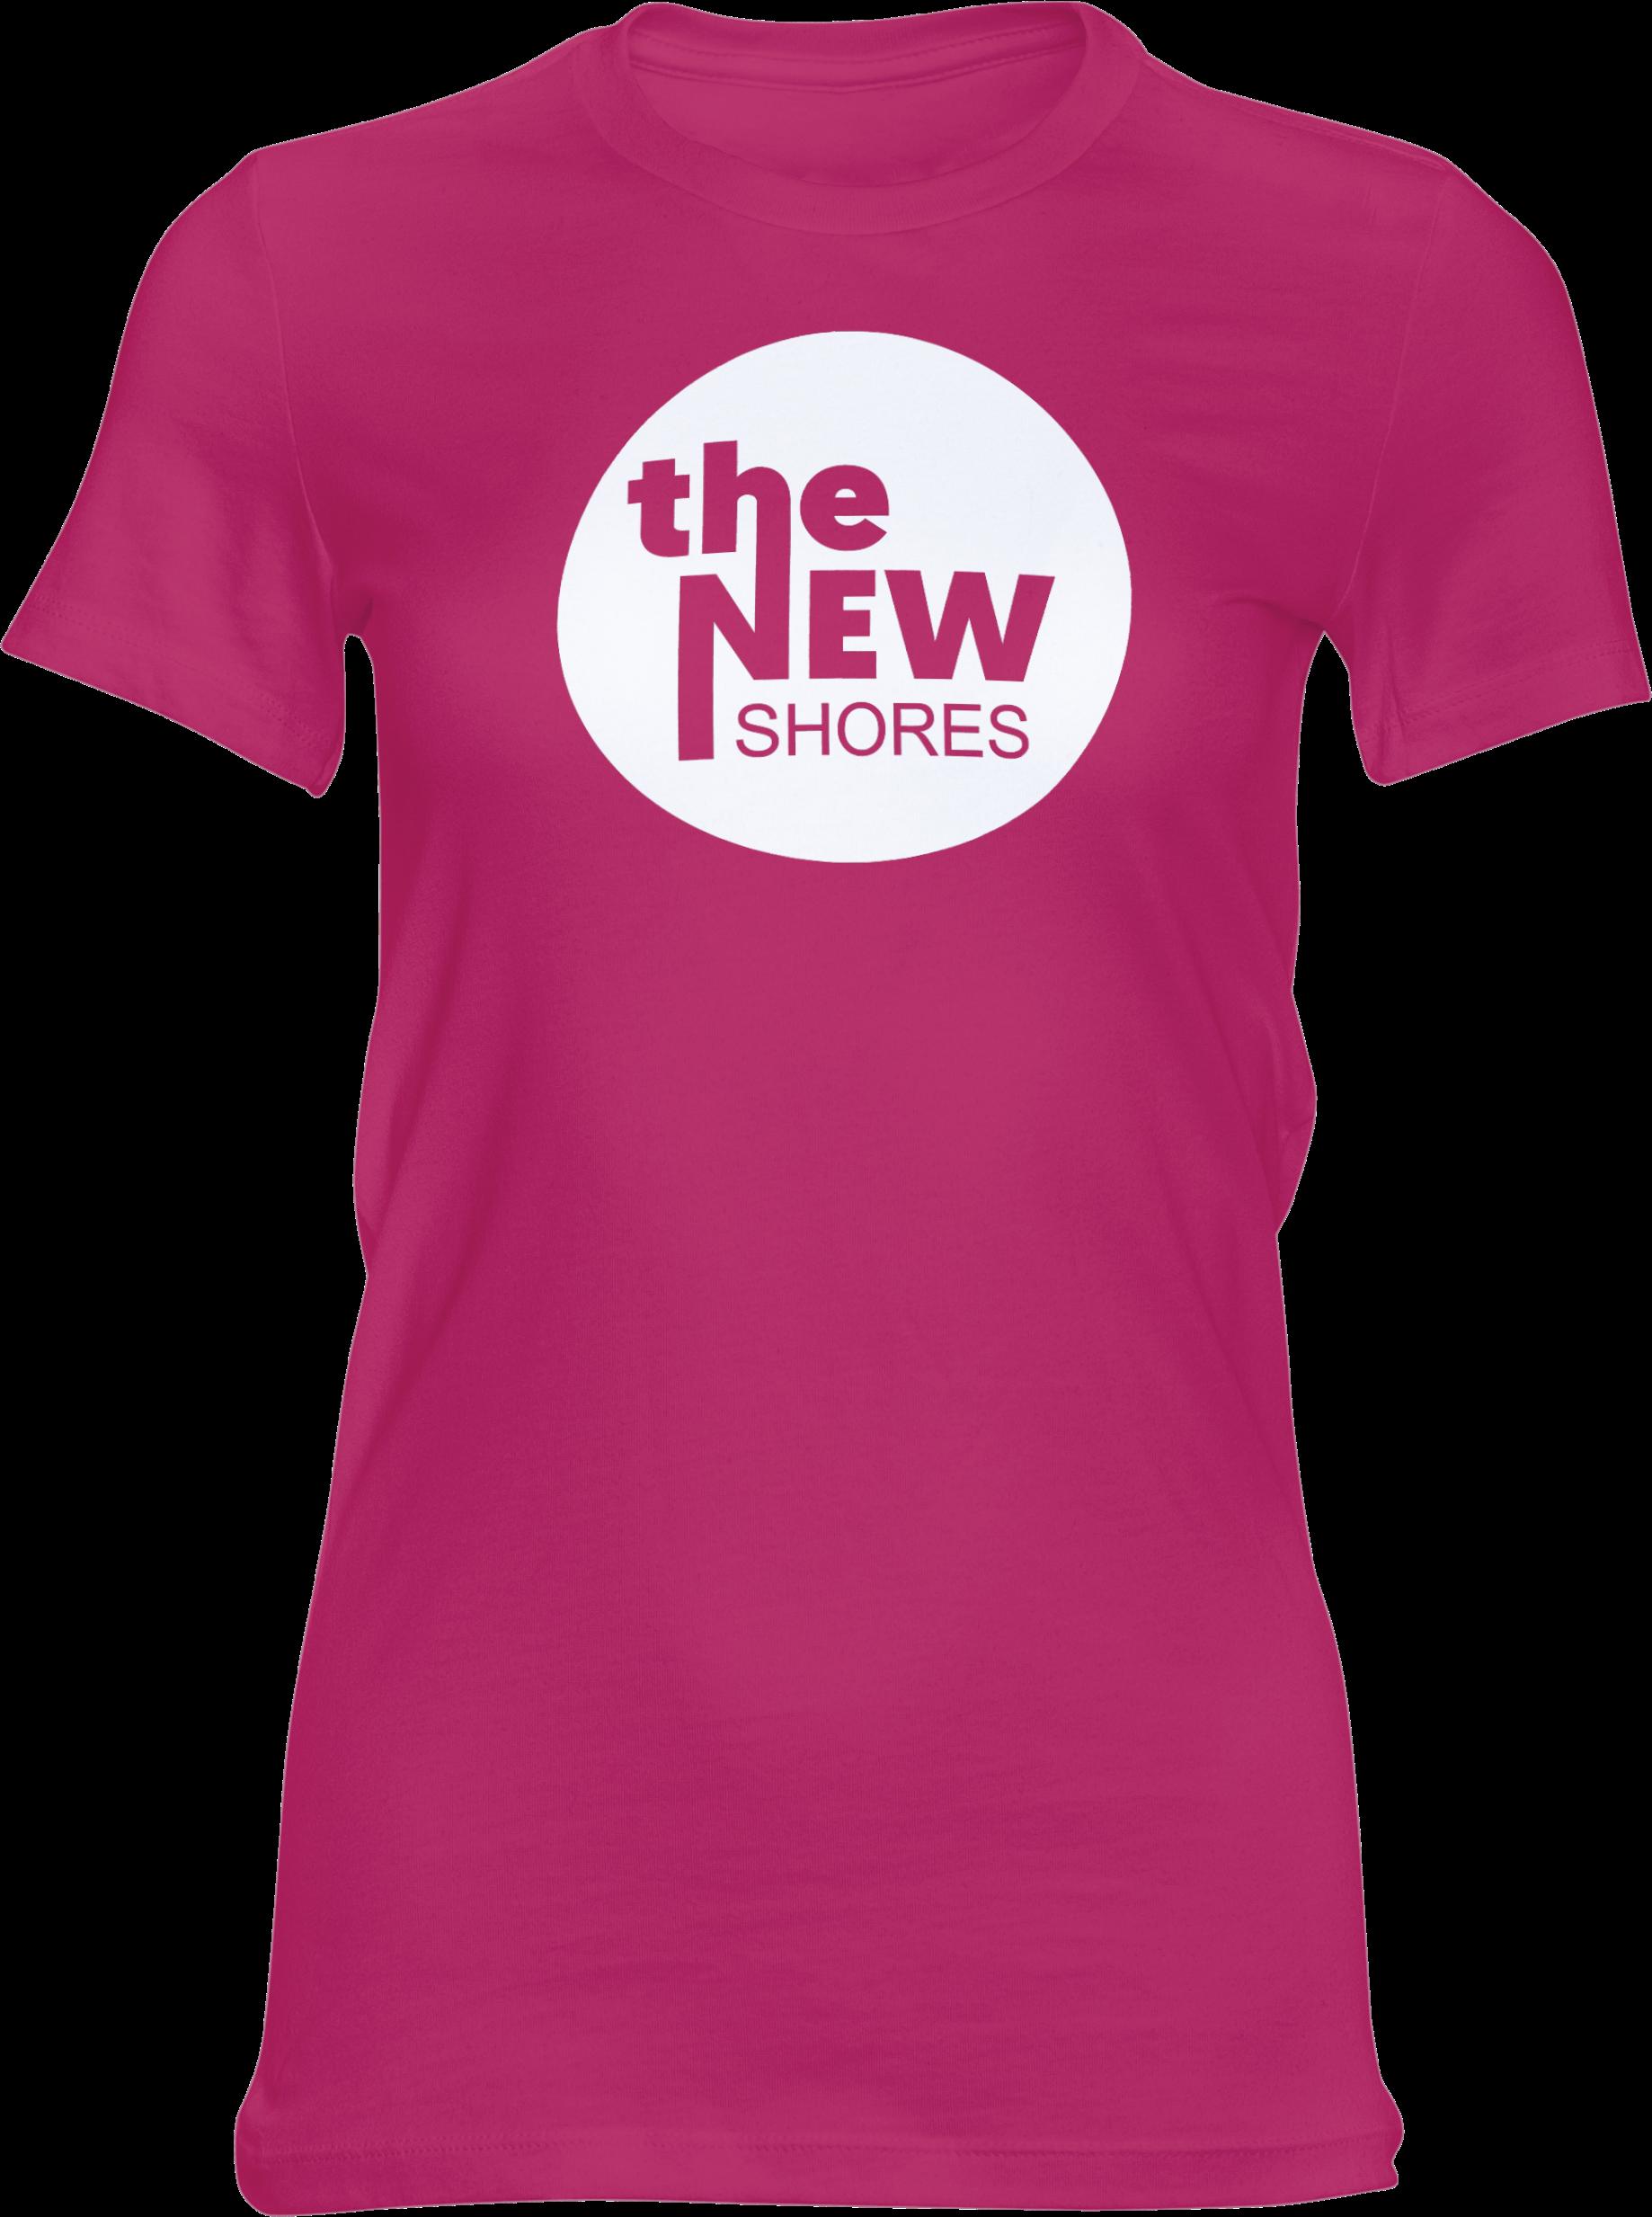 THE NEW SHORES – TNS Logo – Girlie-Shirt (pink)